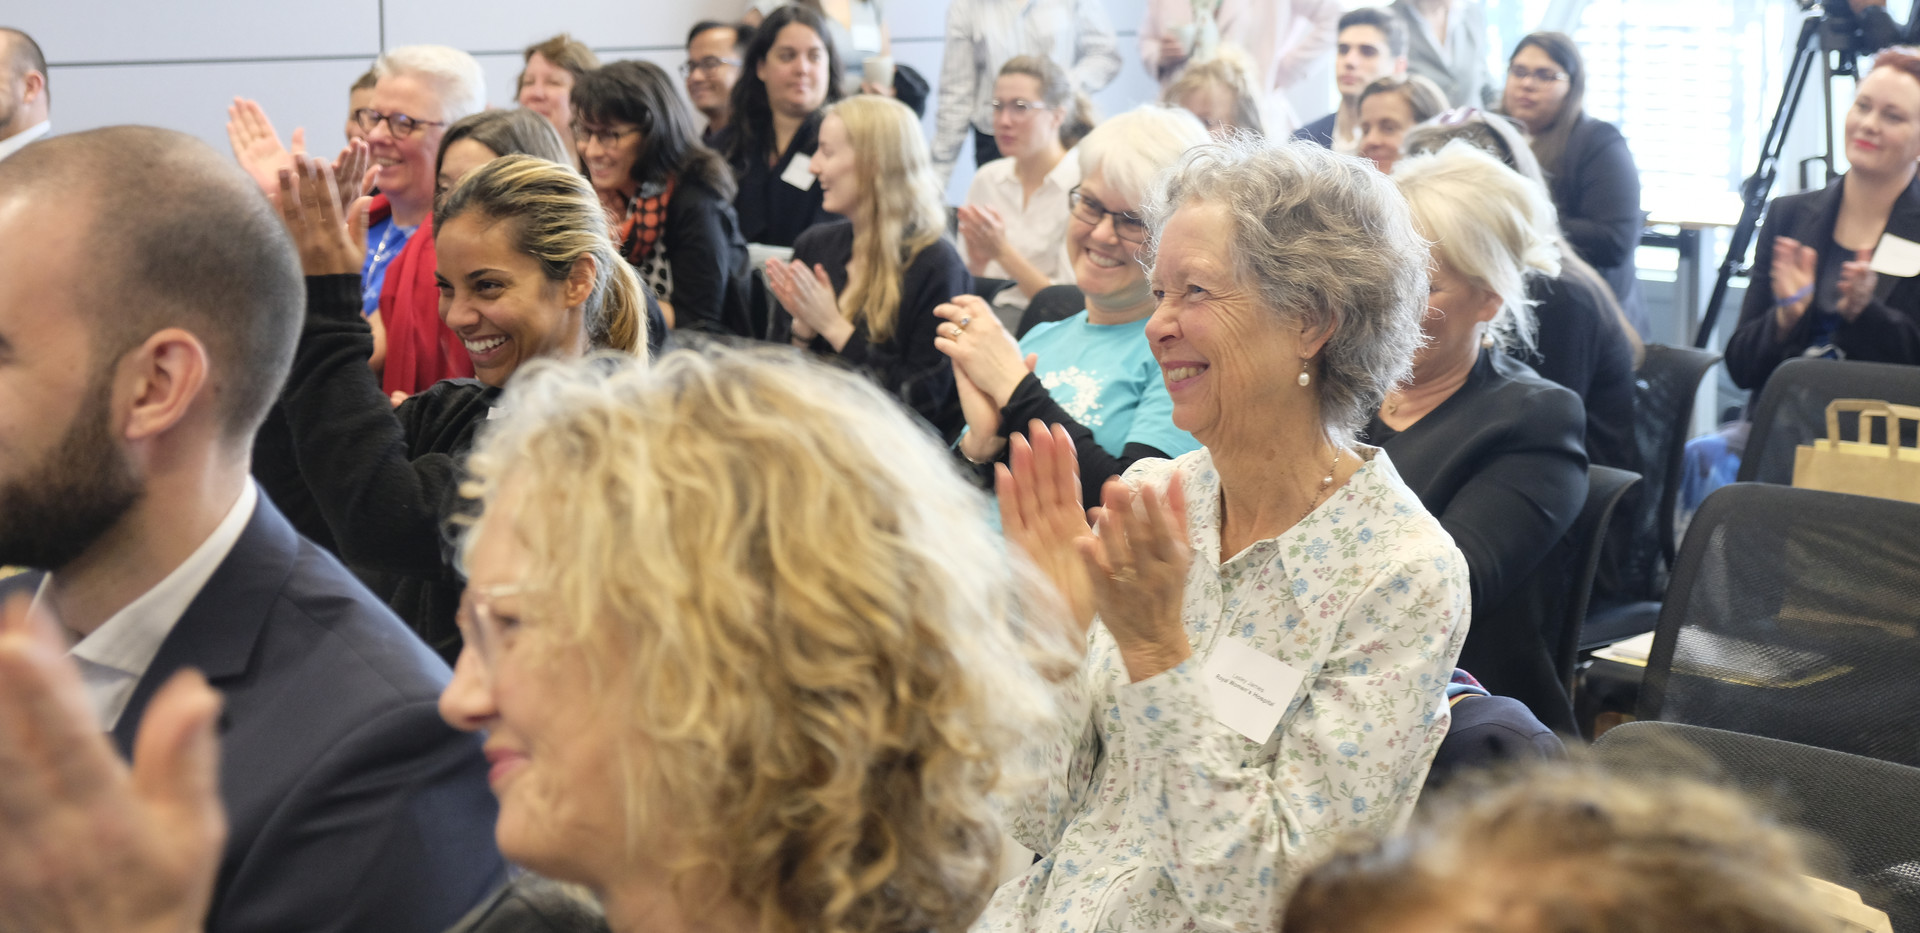 Smiling crowd.jpg